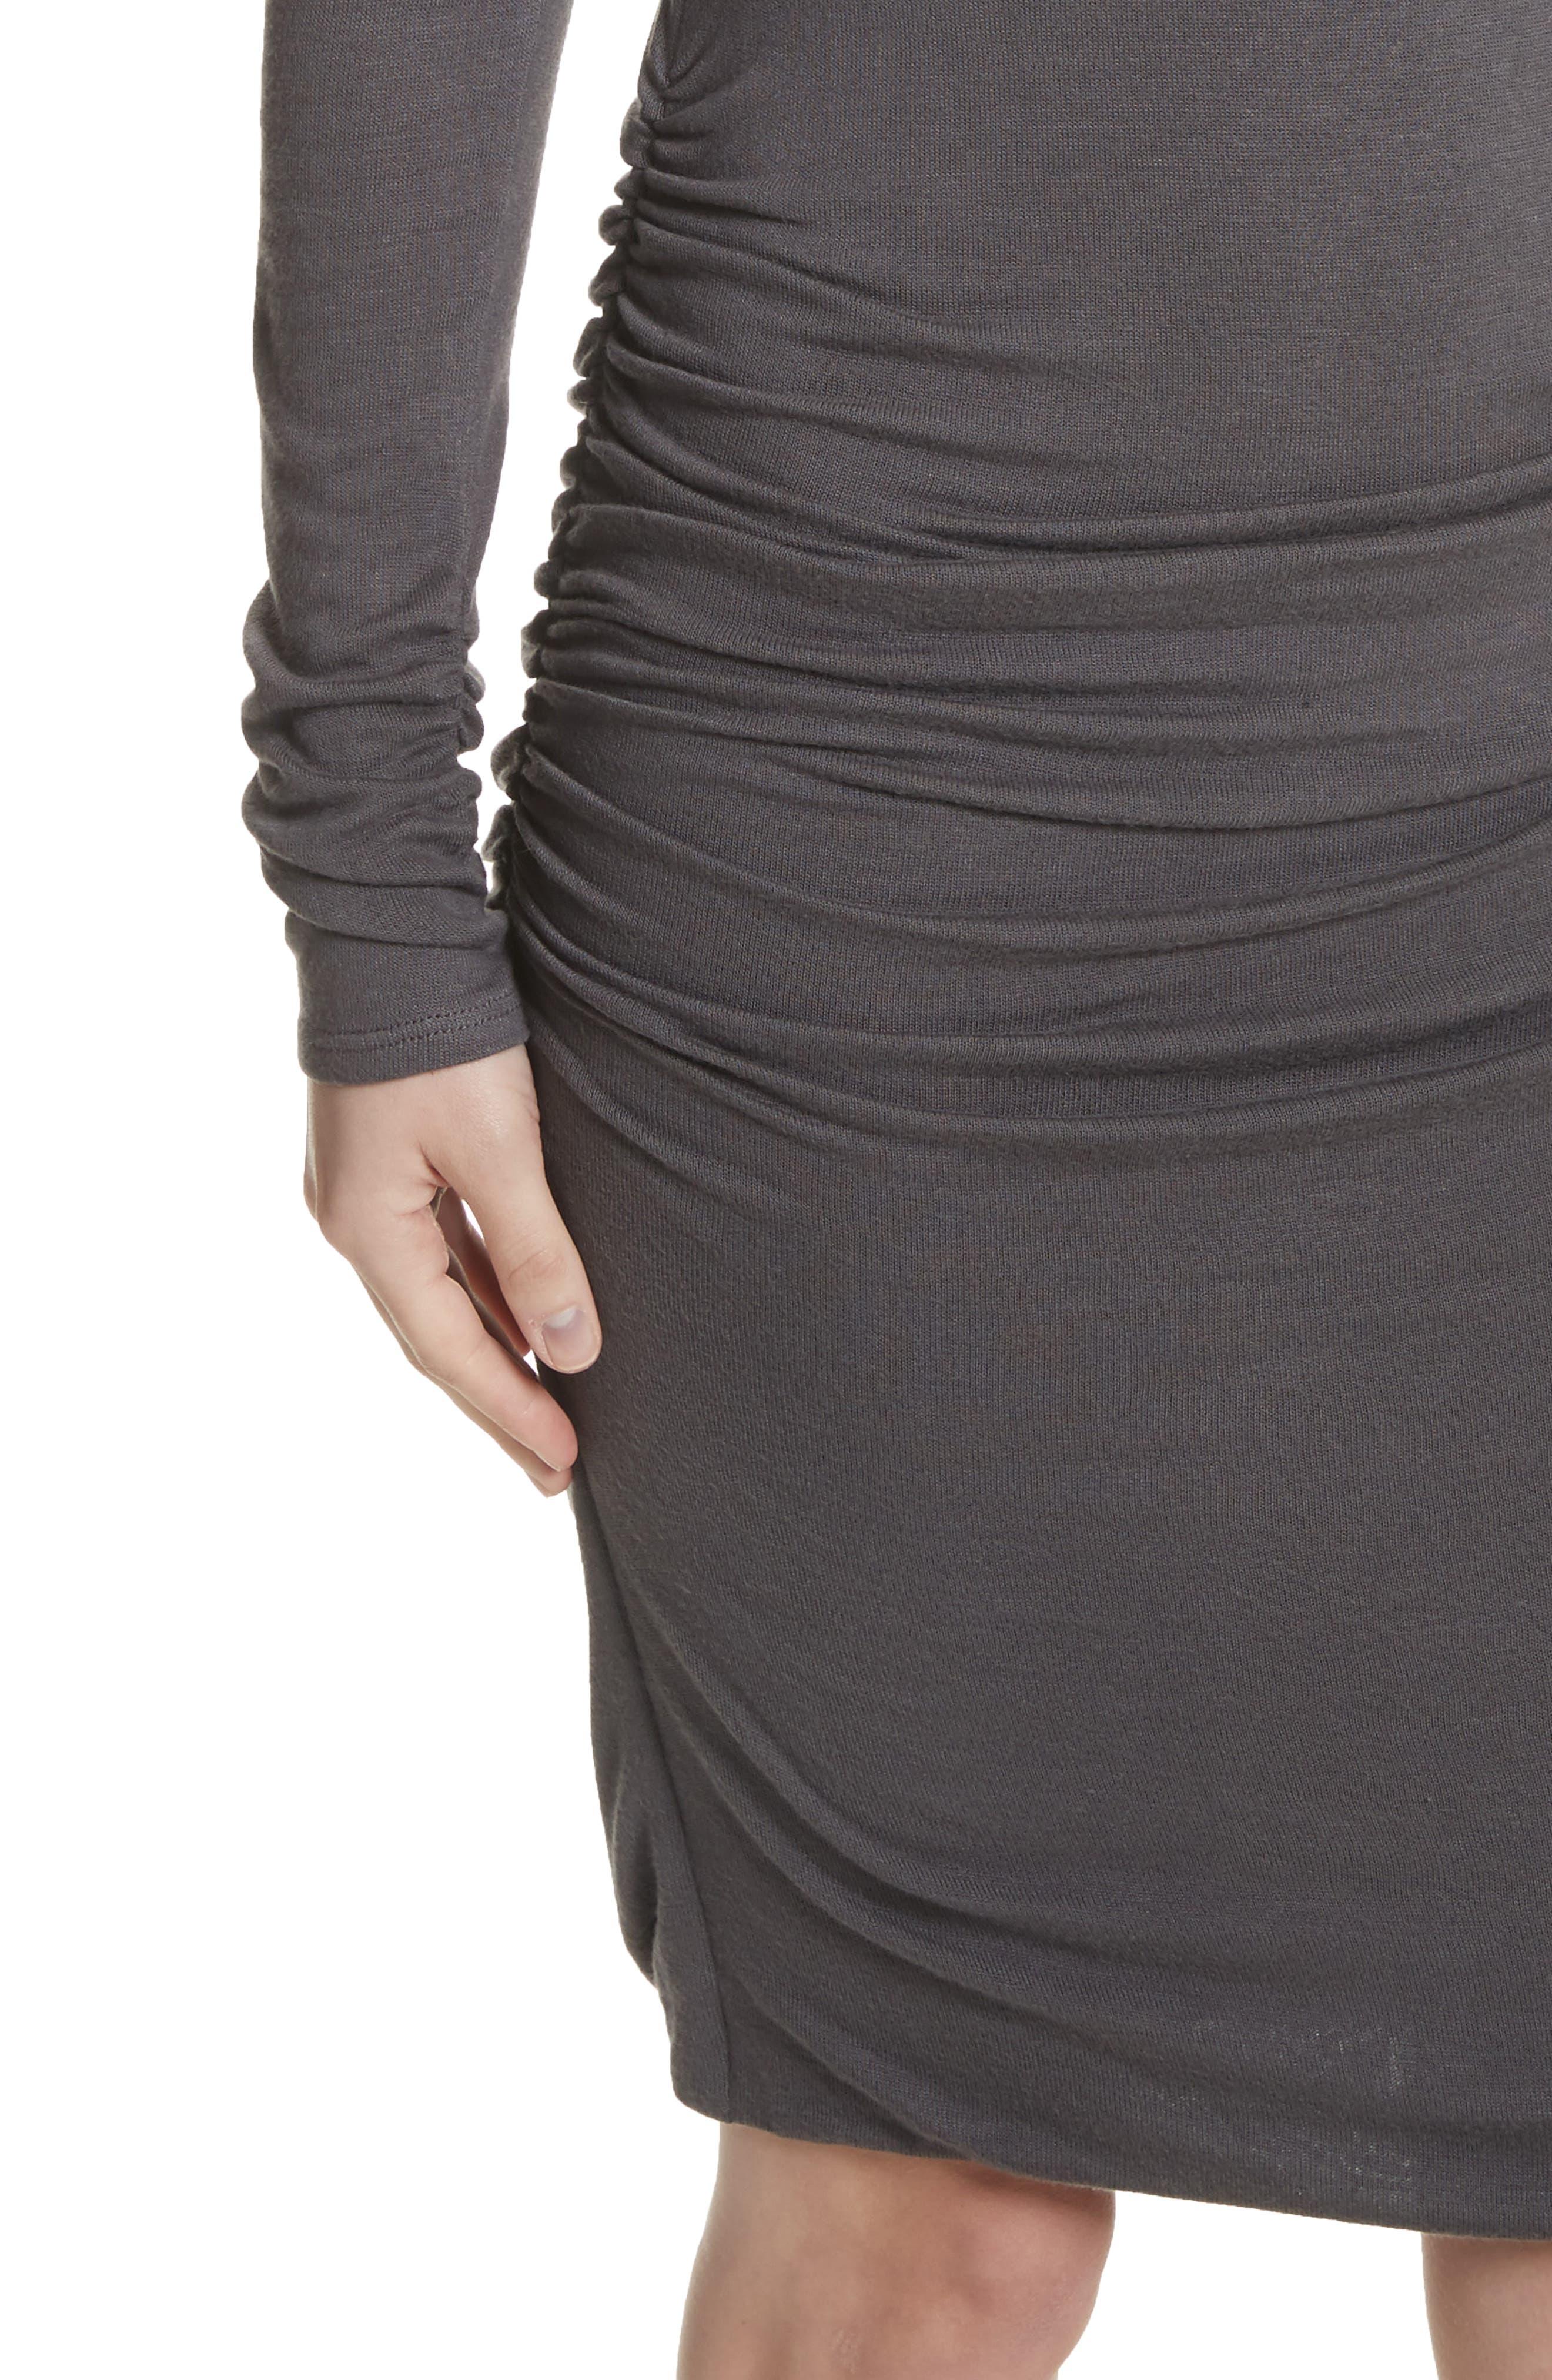 Body-Con Turtleneck Dress,                             Alternate thumbnail 4, color,                             Gunmetal